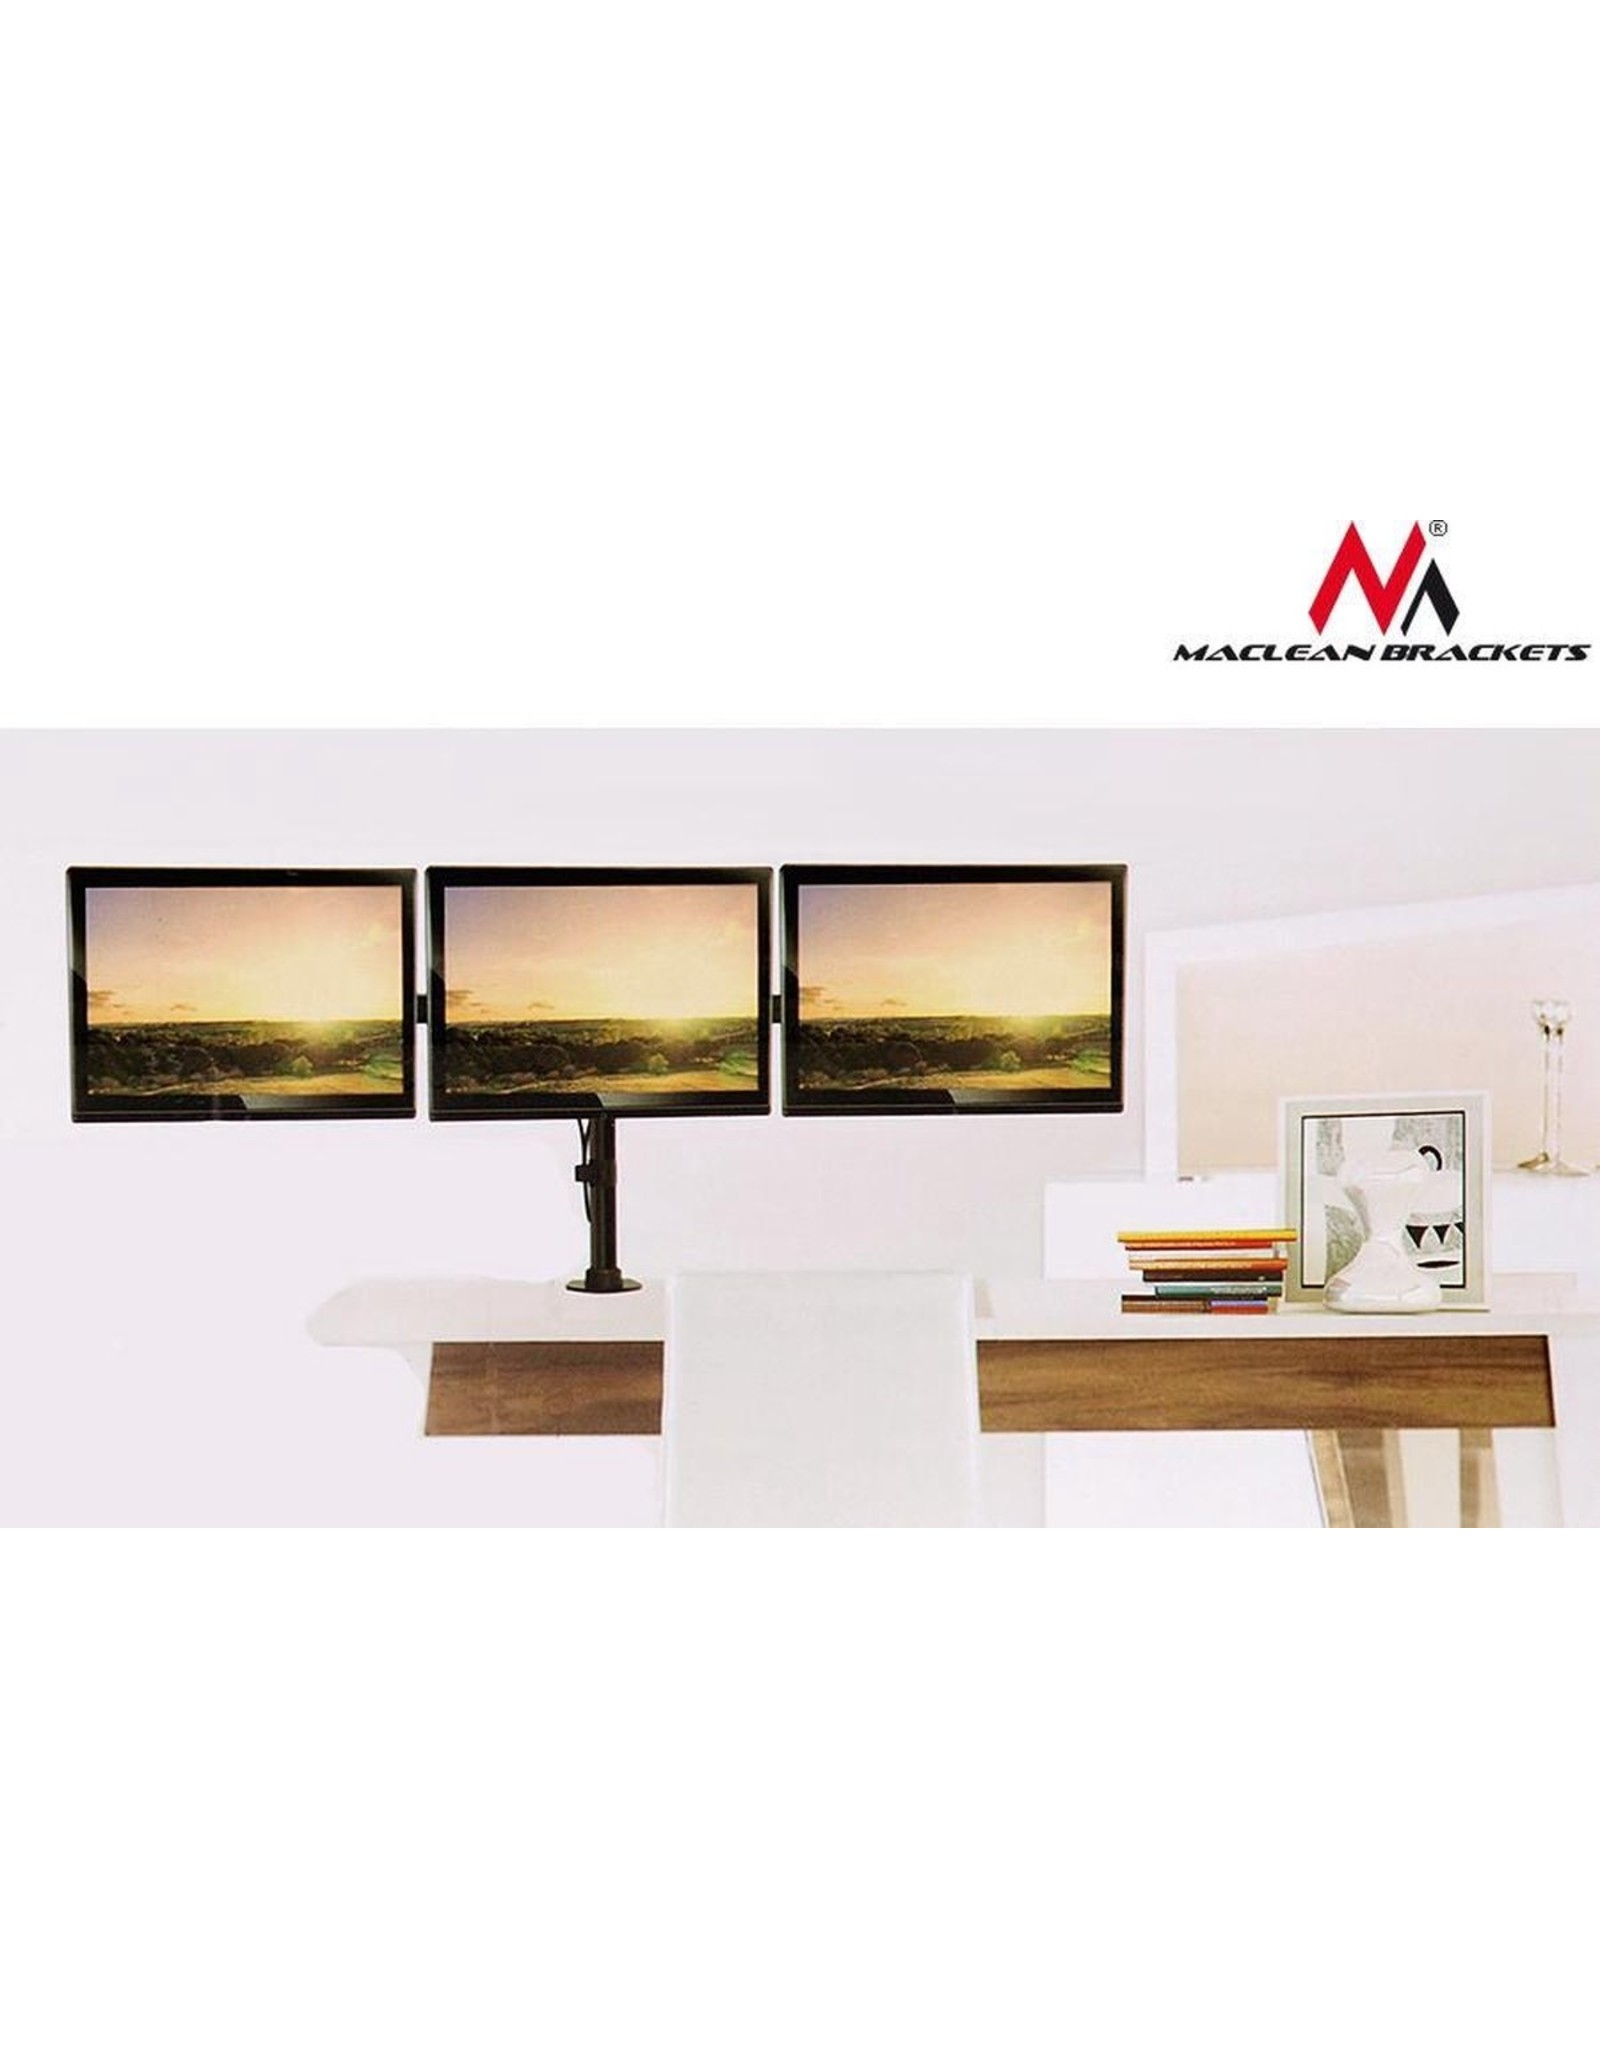 Maclean Maclean  MC-691 - Drievoudige monitor bureaubeugel